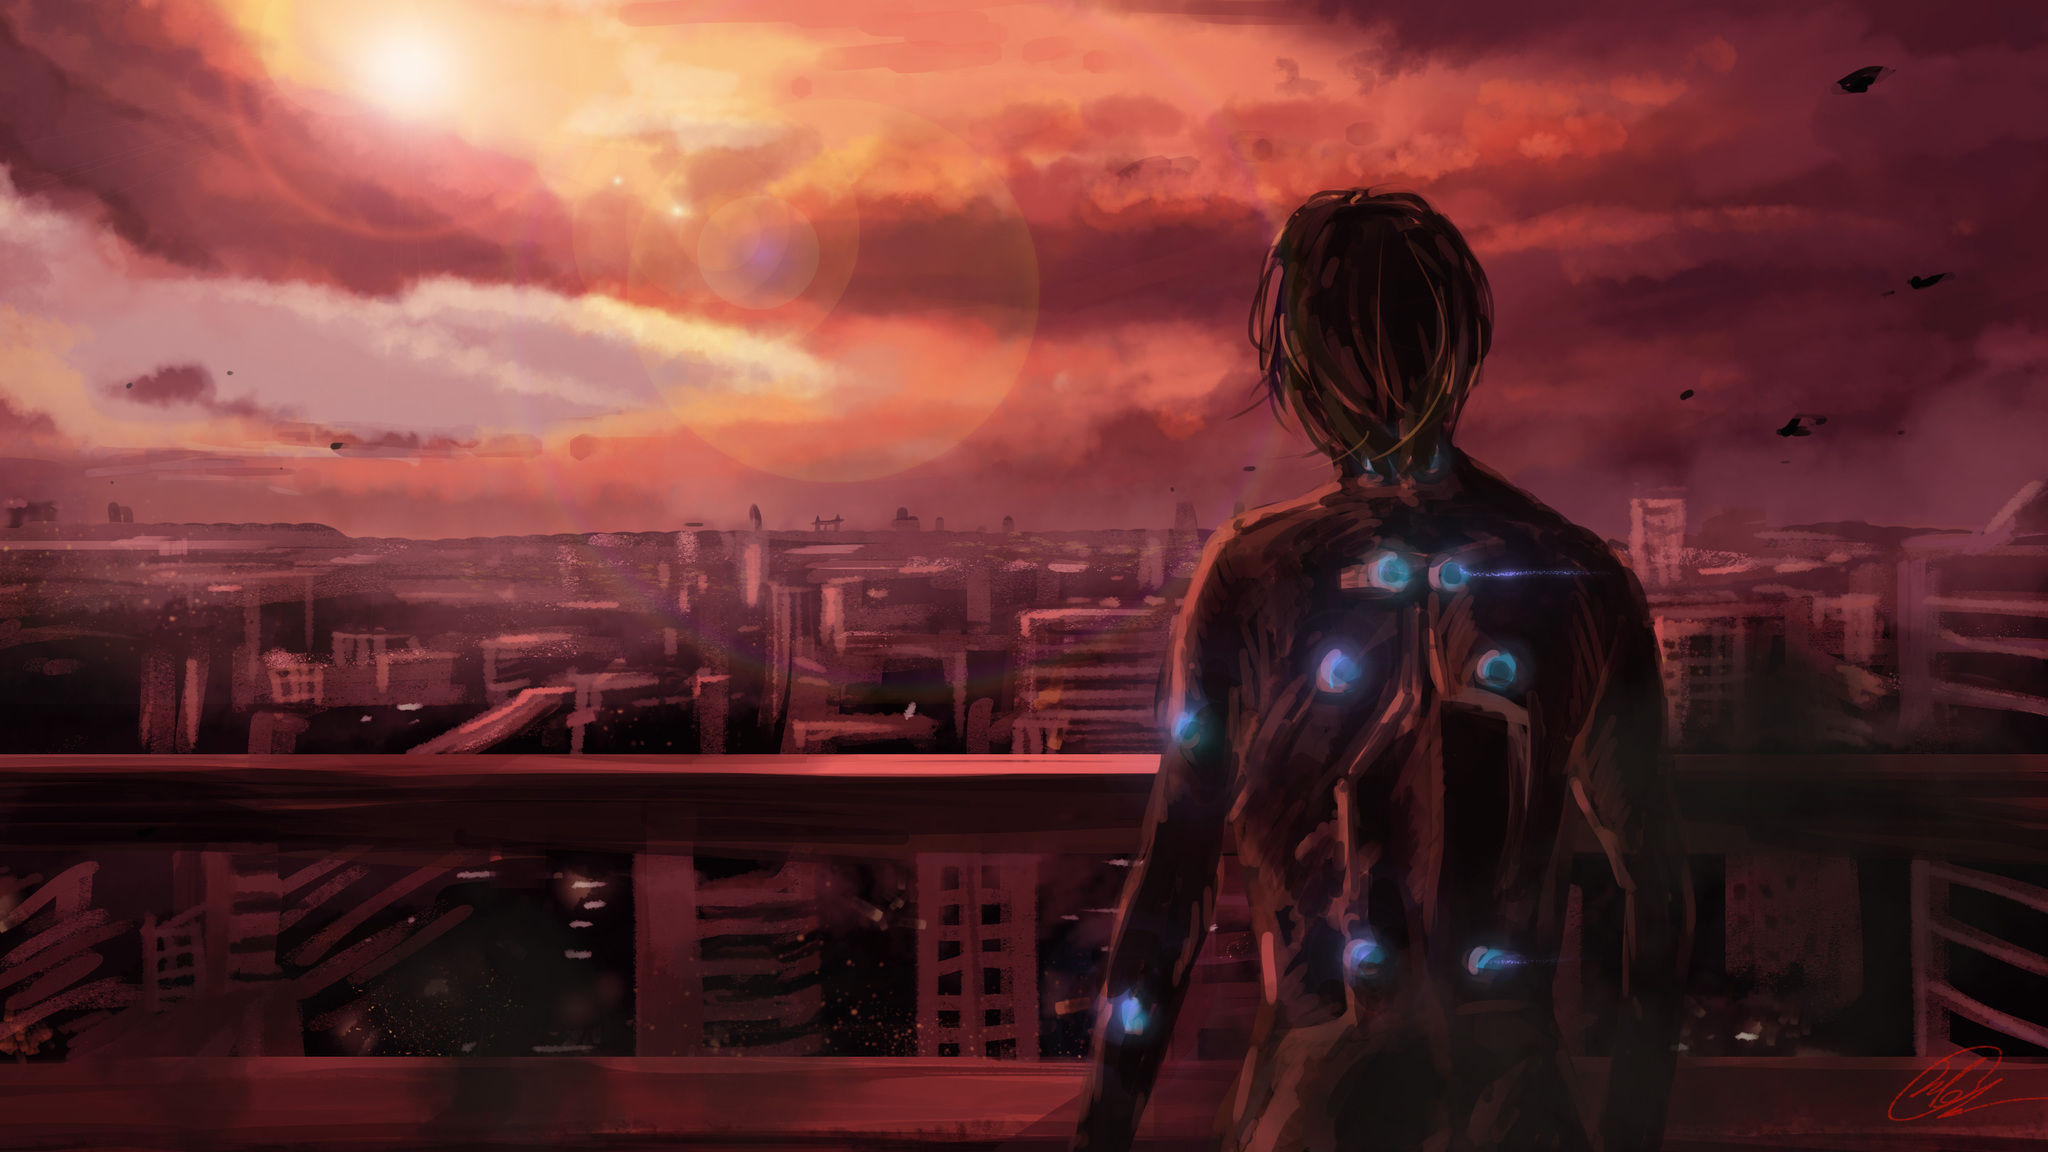 2048x1152 Science Fiction Gantz Anime Manga Series 4k